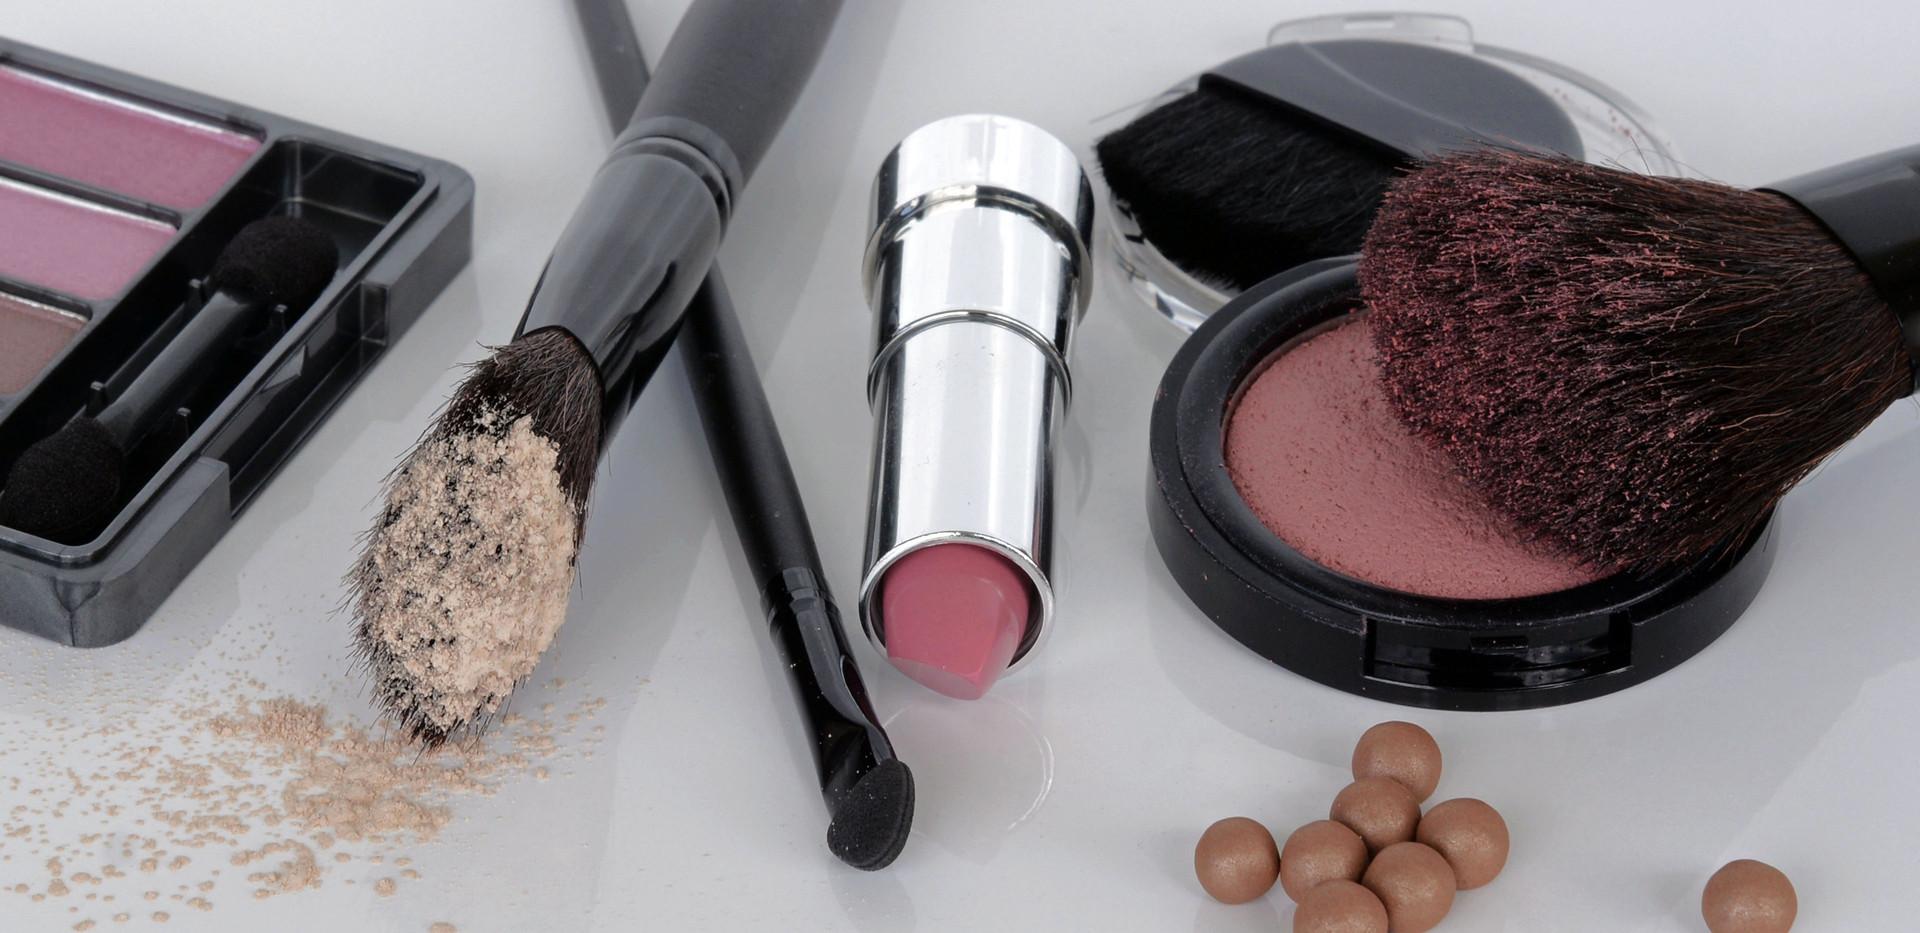 brush-female-powder-lip-make-up-human-bo